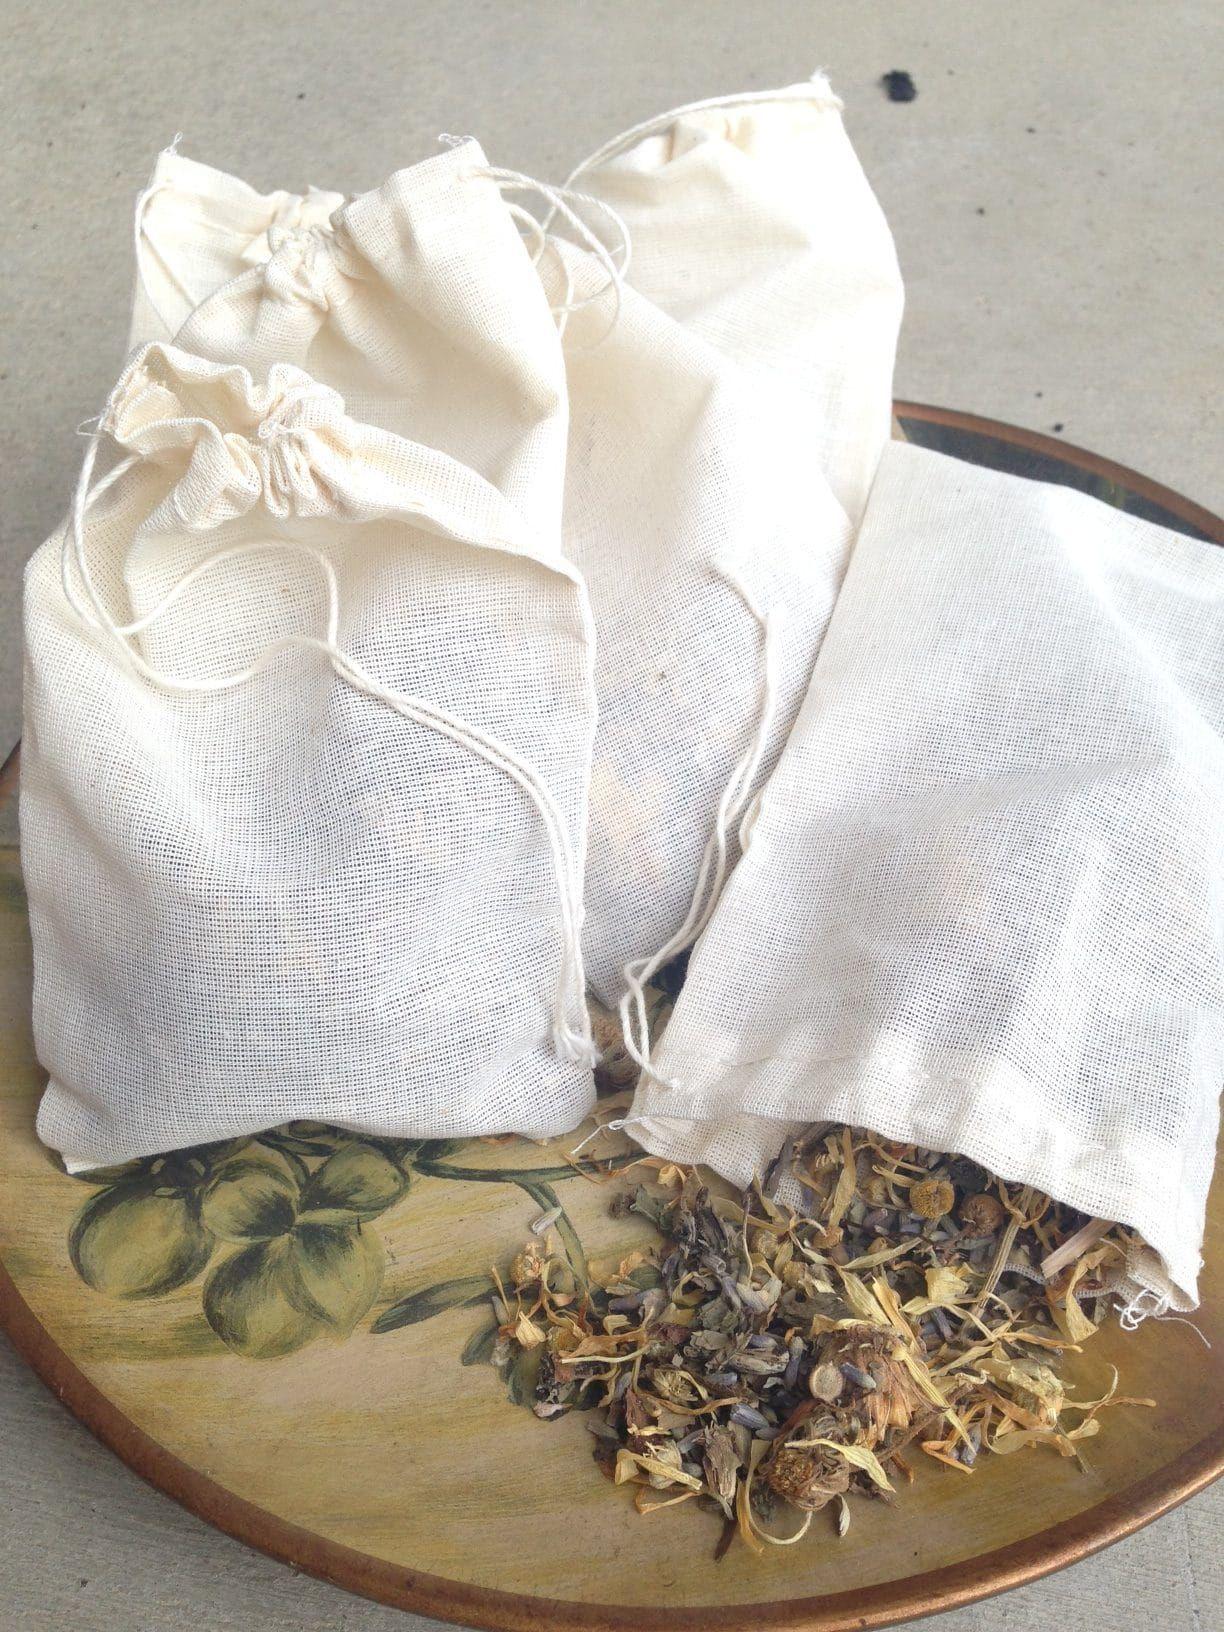 How to make a postpartum herbal bath herbal bath